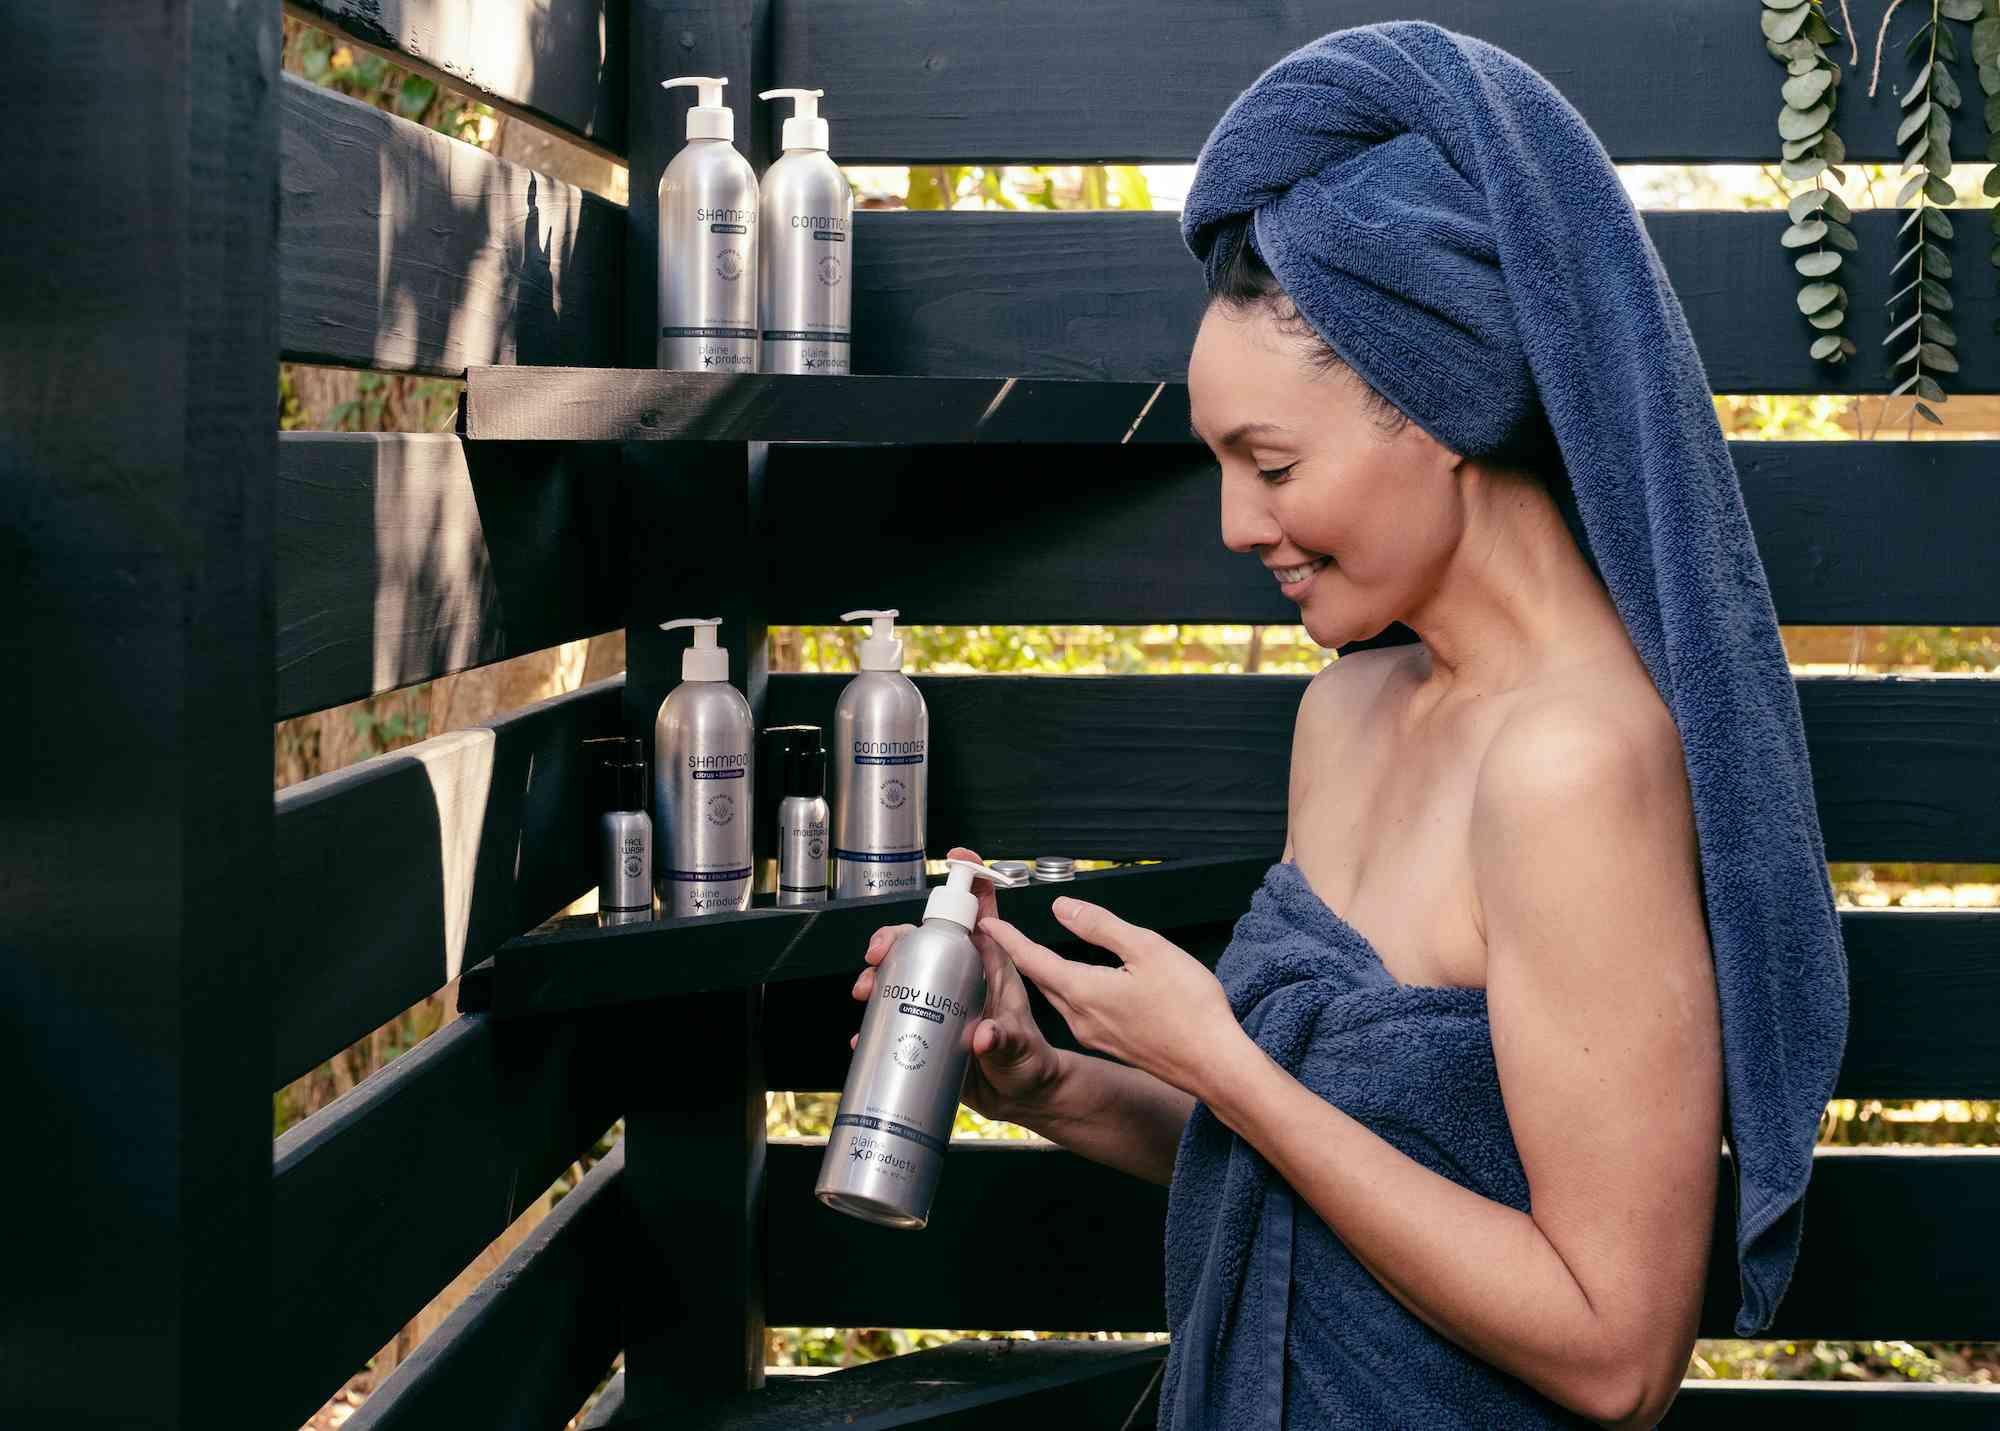 Plaine Products shower model